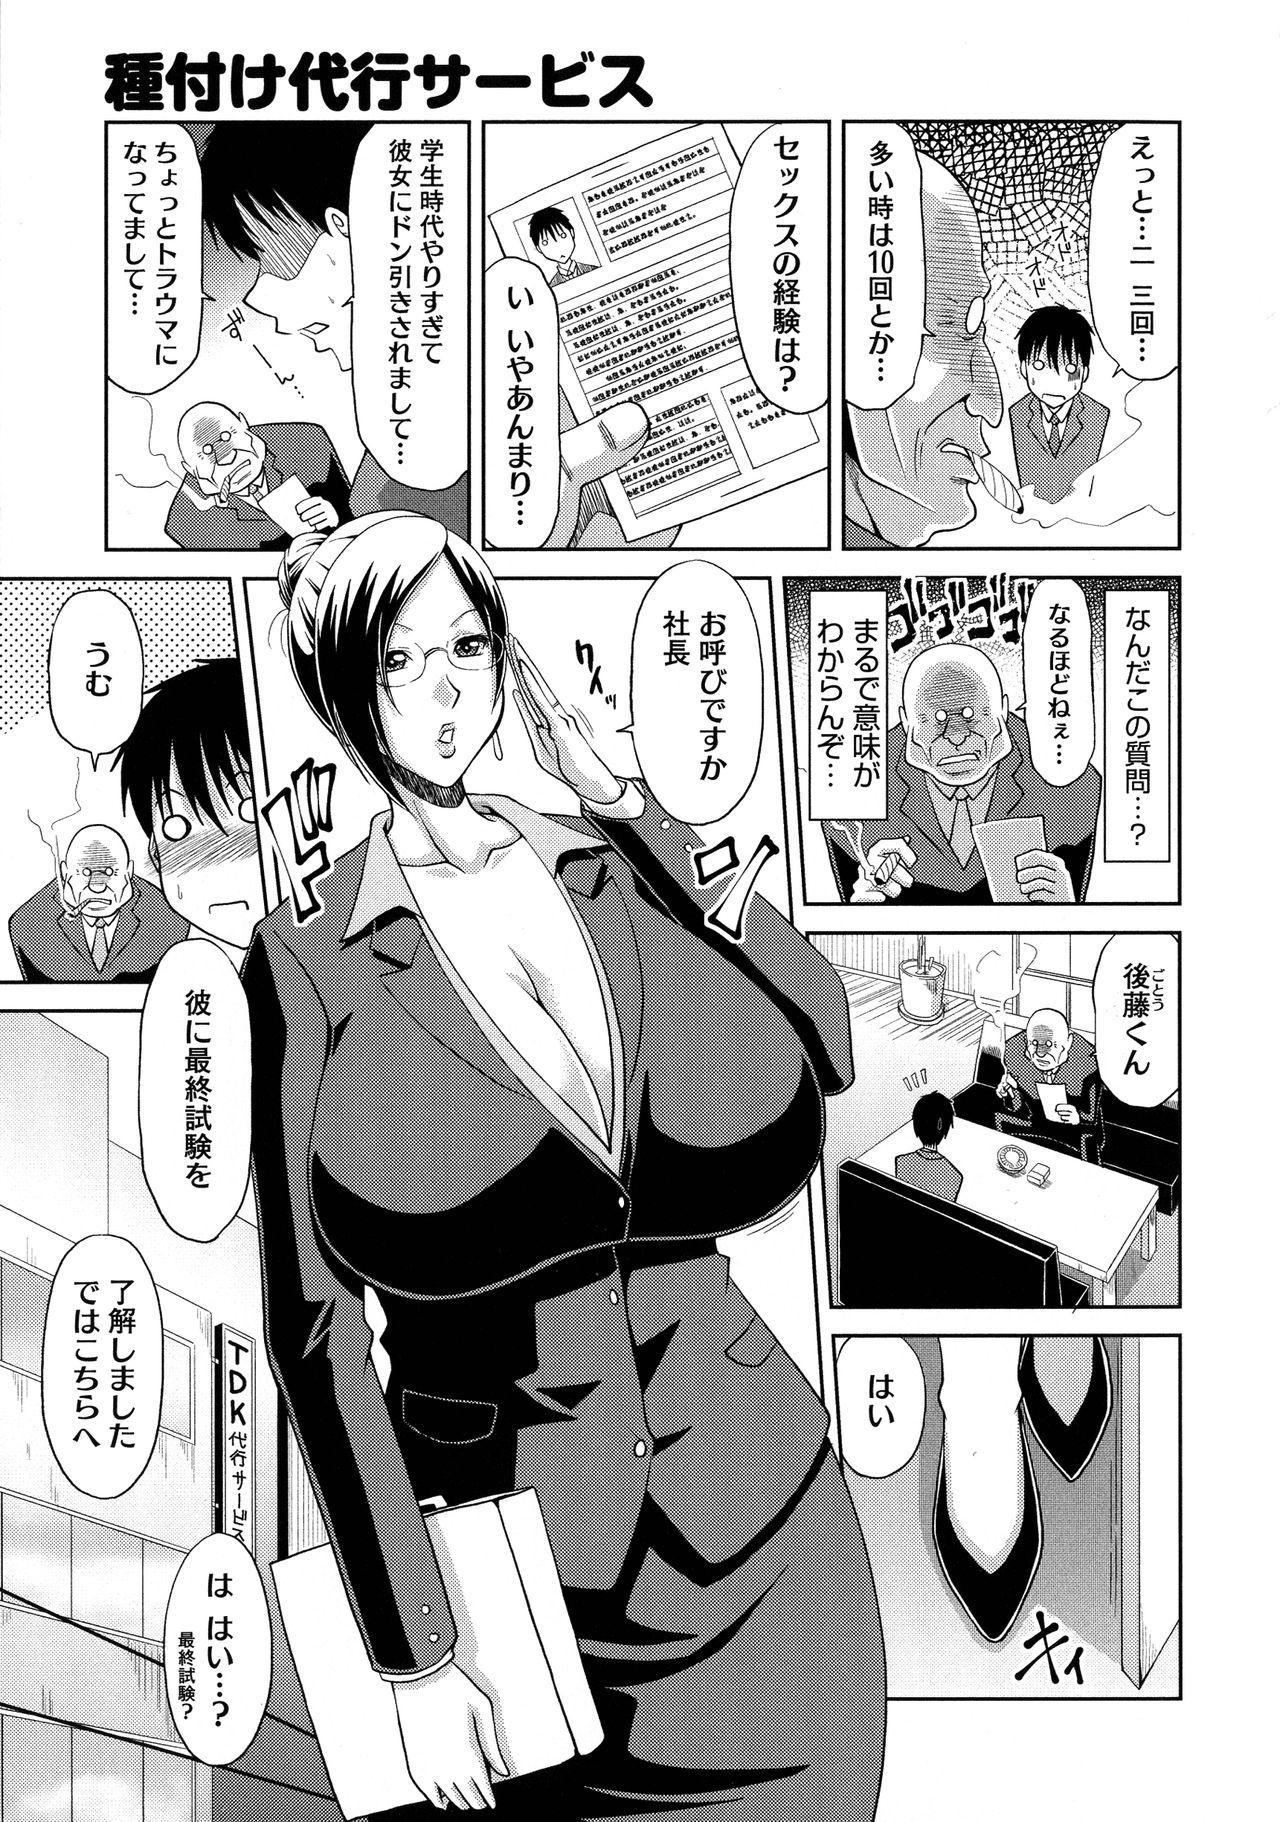 Haramase! 155